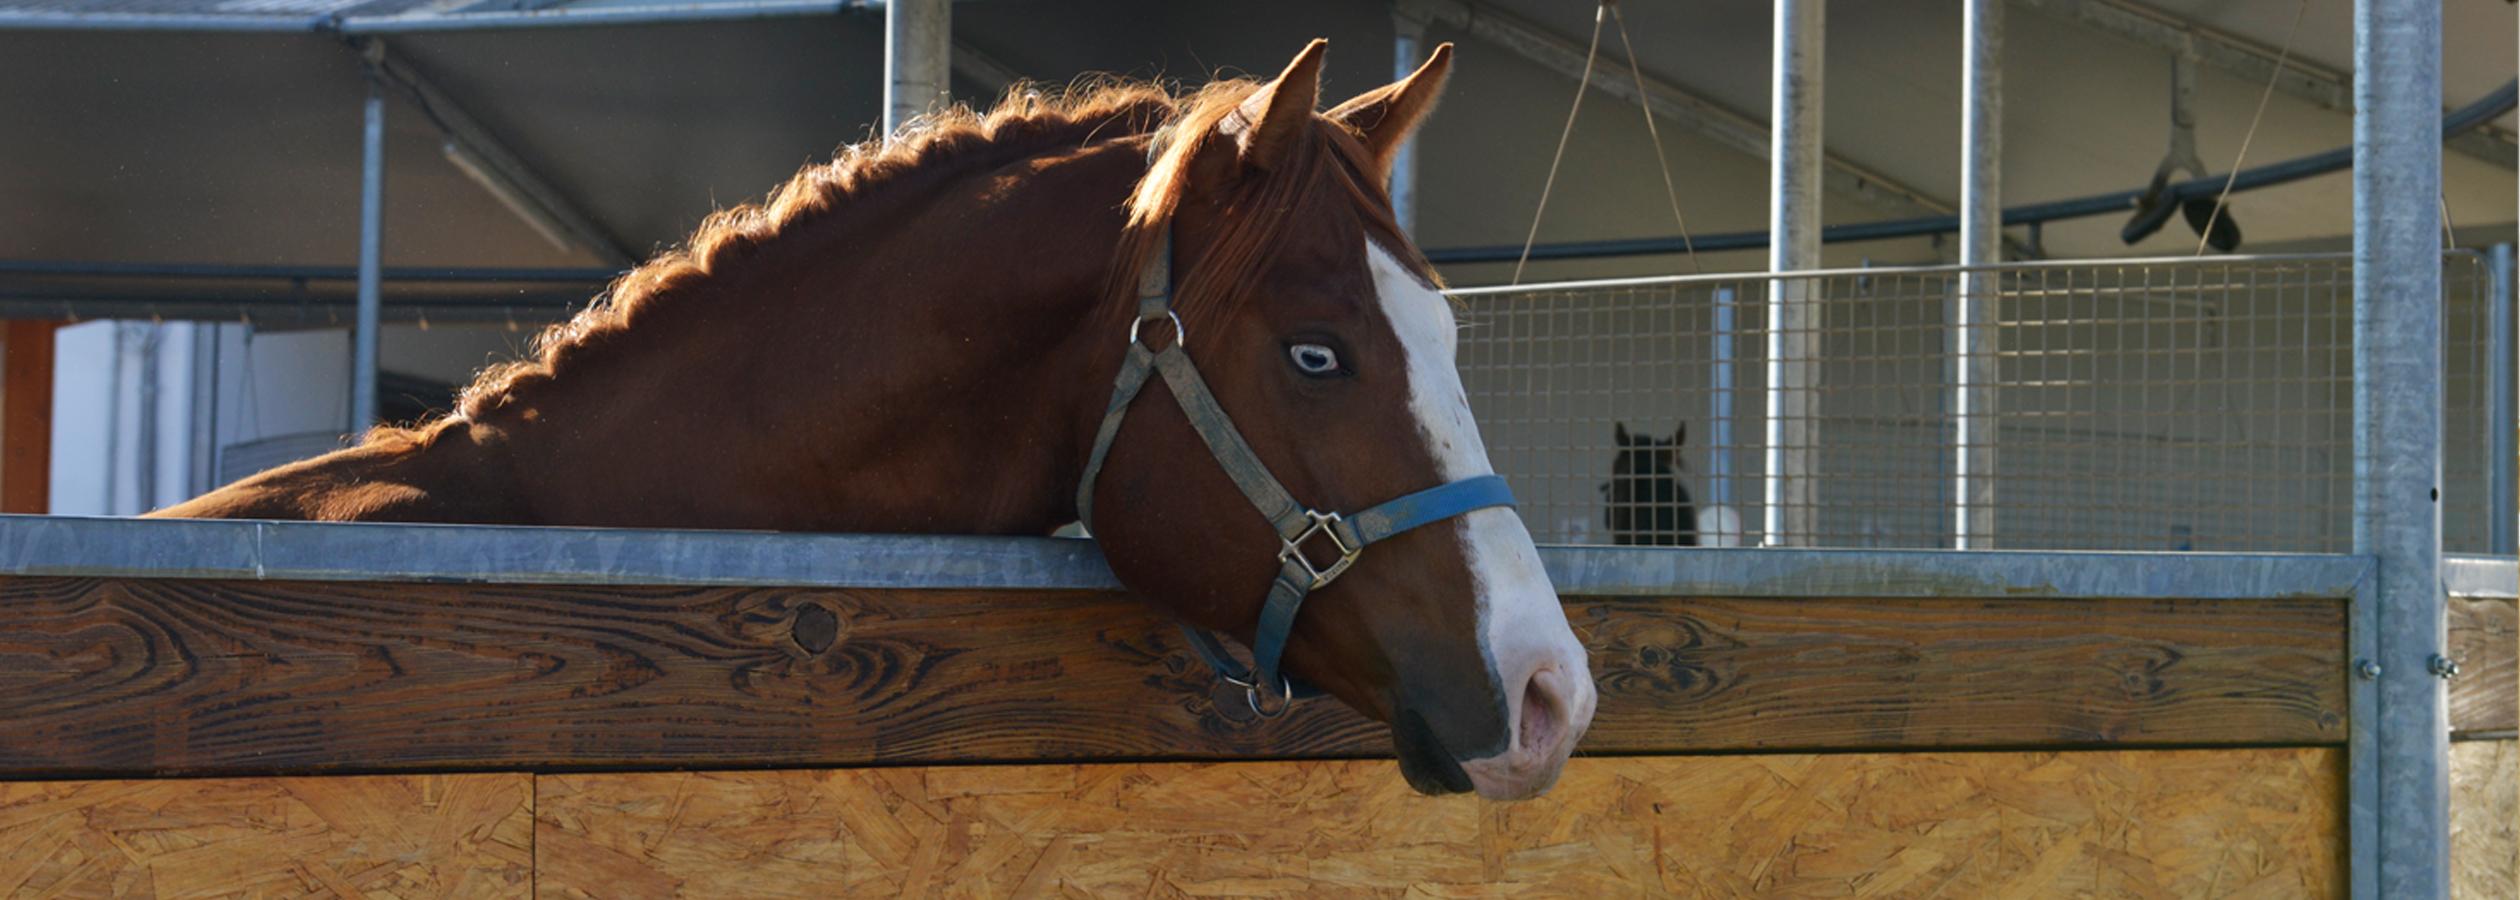 Header_HorseAcademy_AGA3493